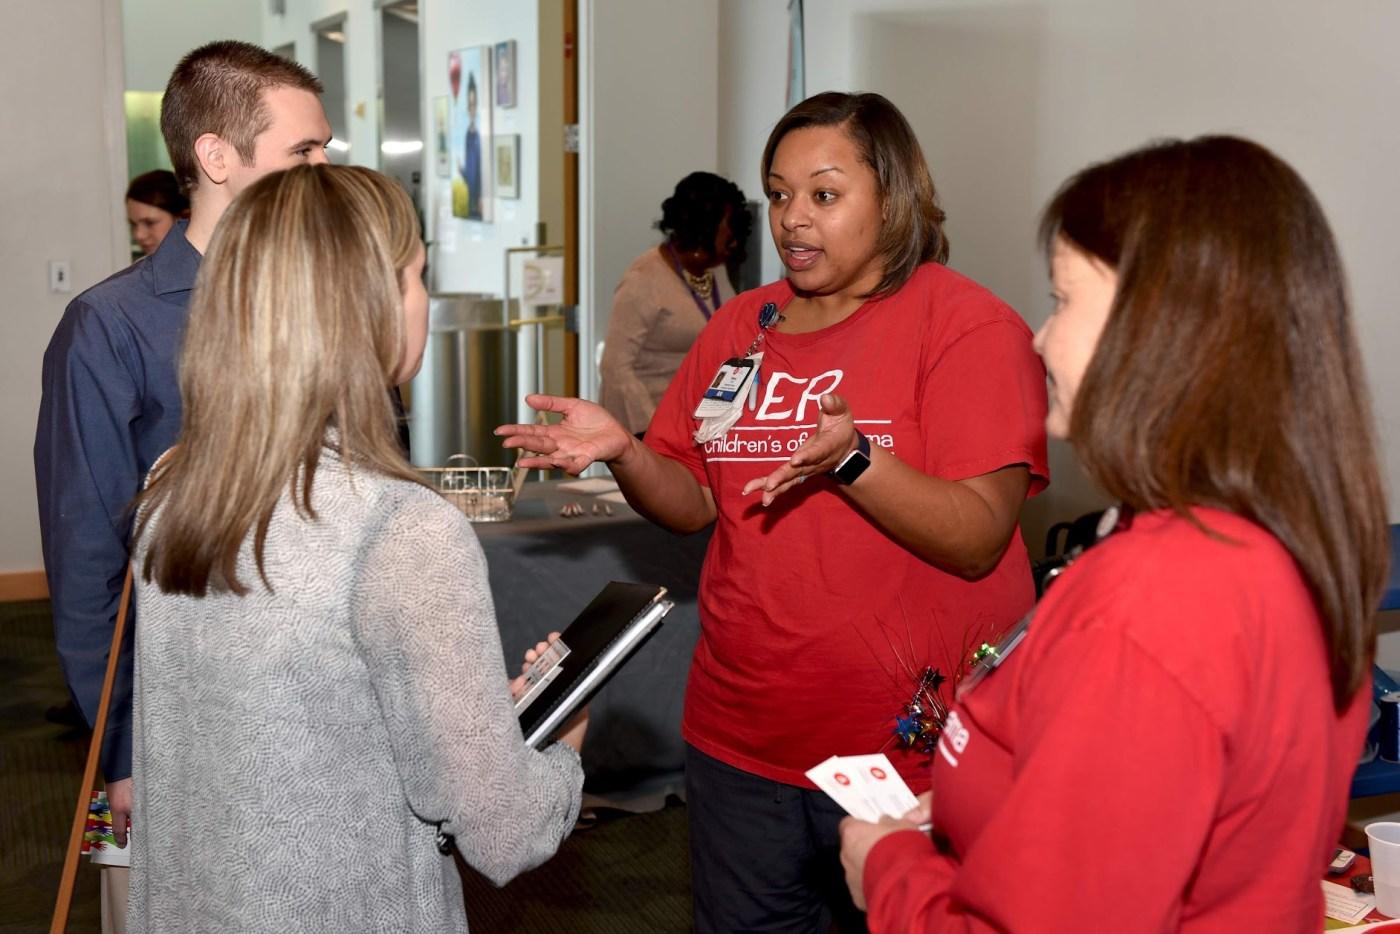 Children's of AL nursing career fair